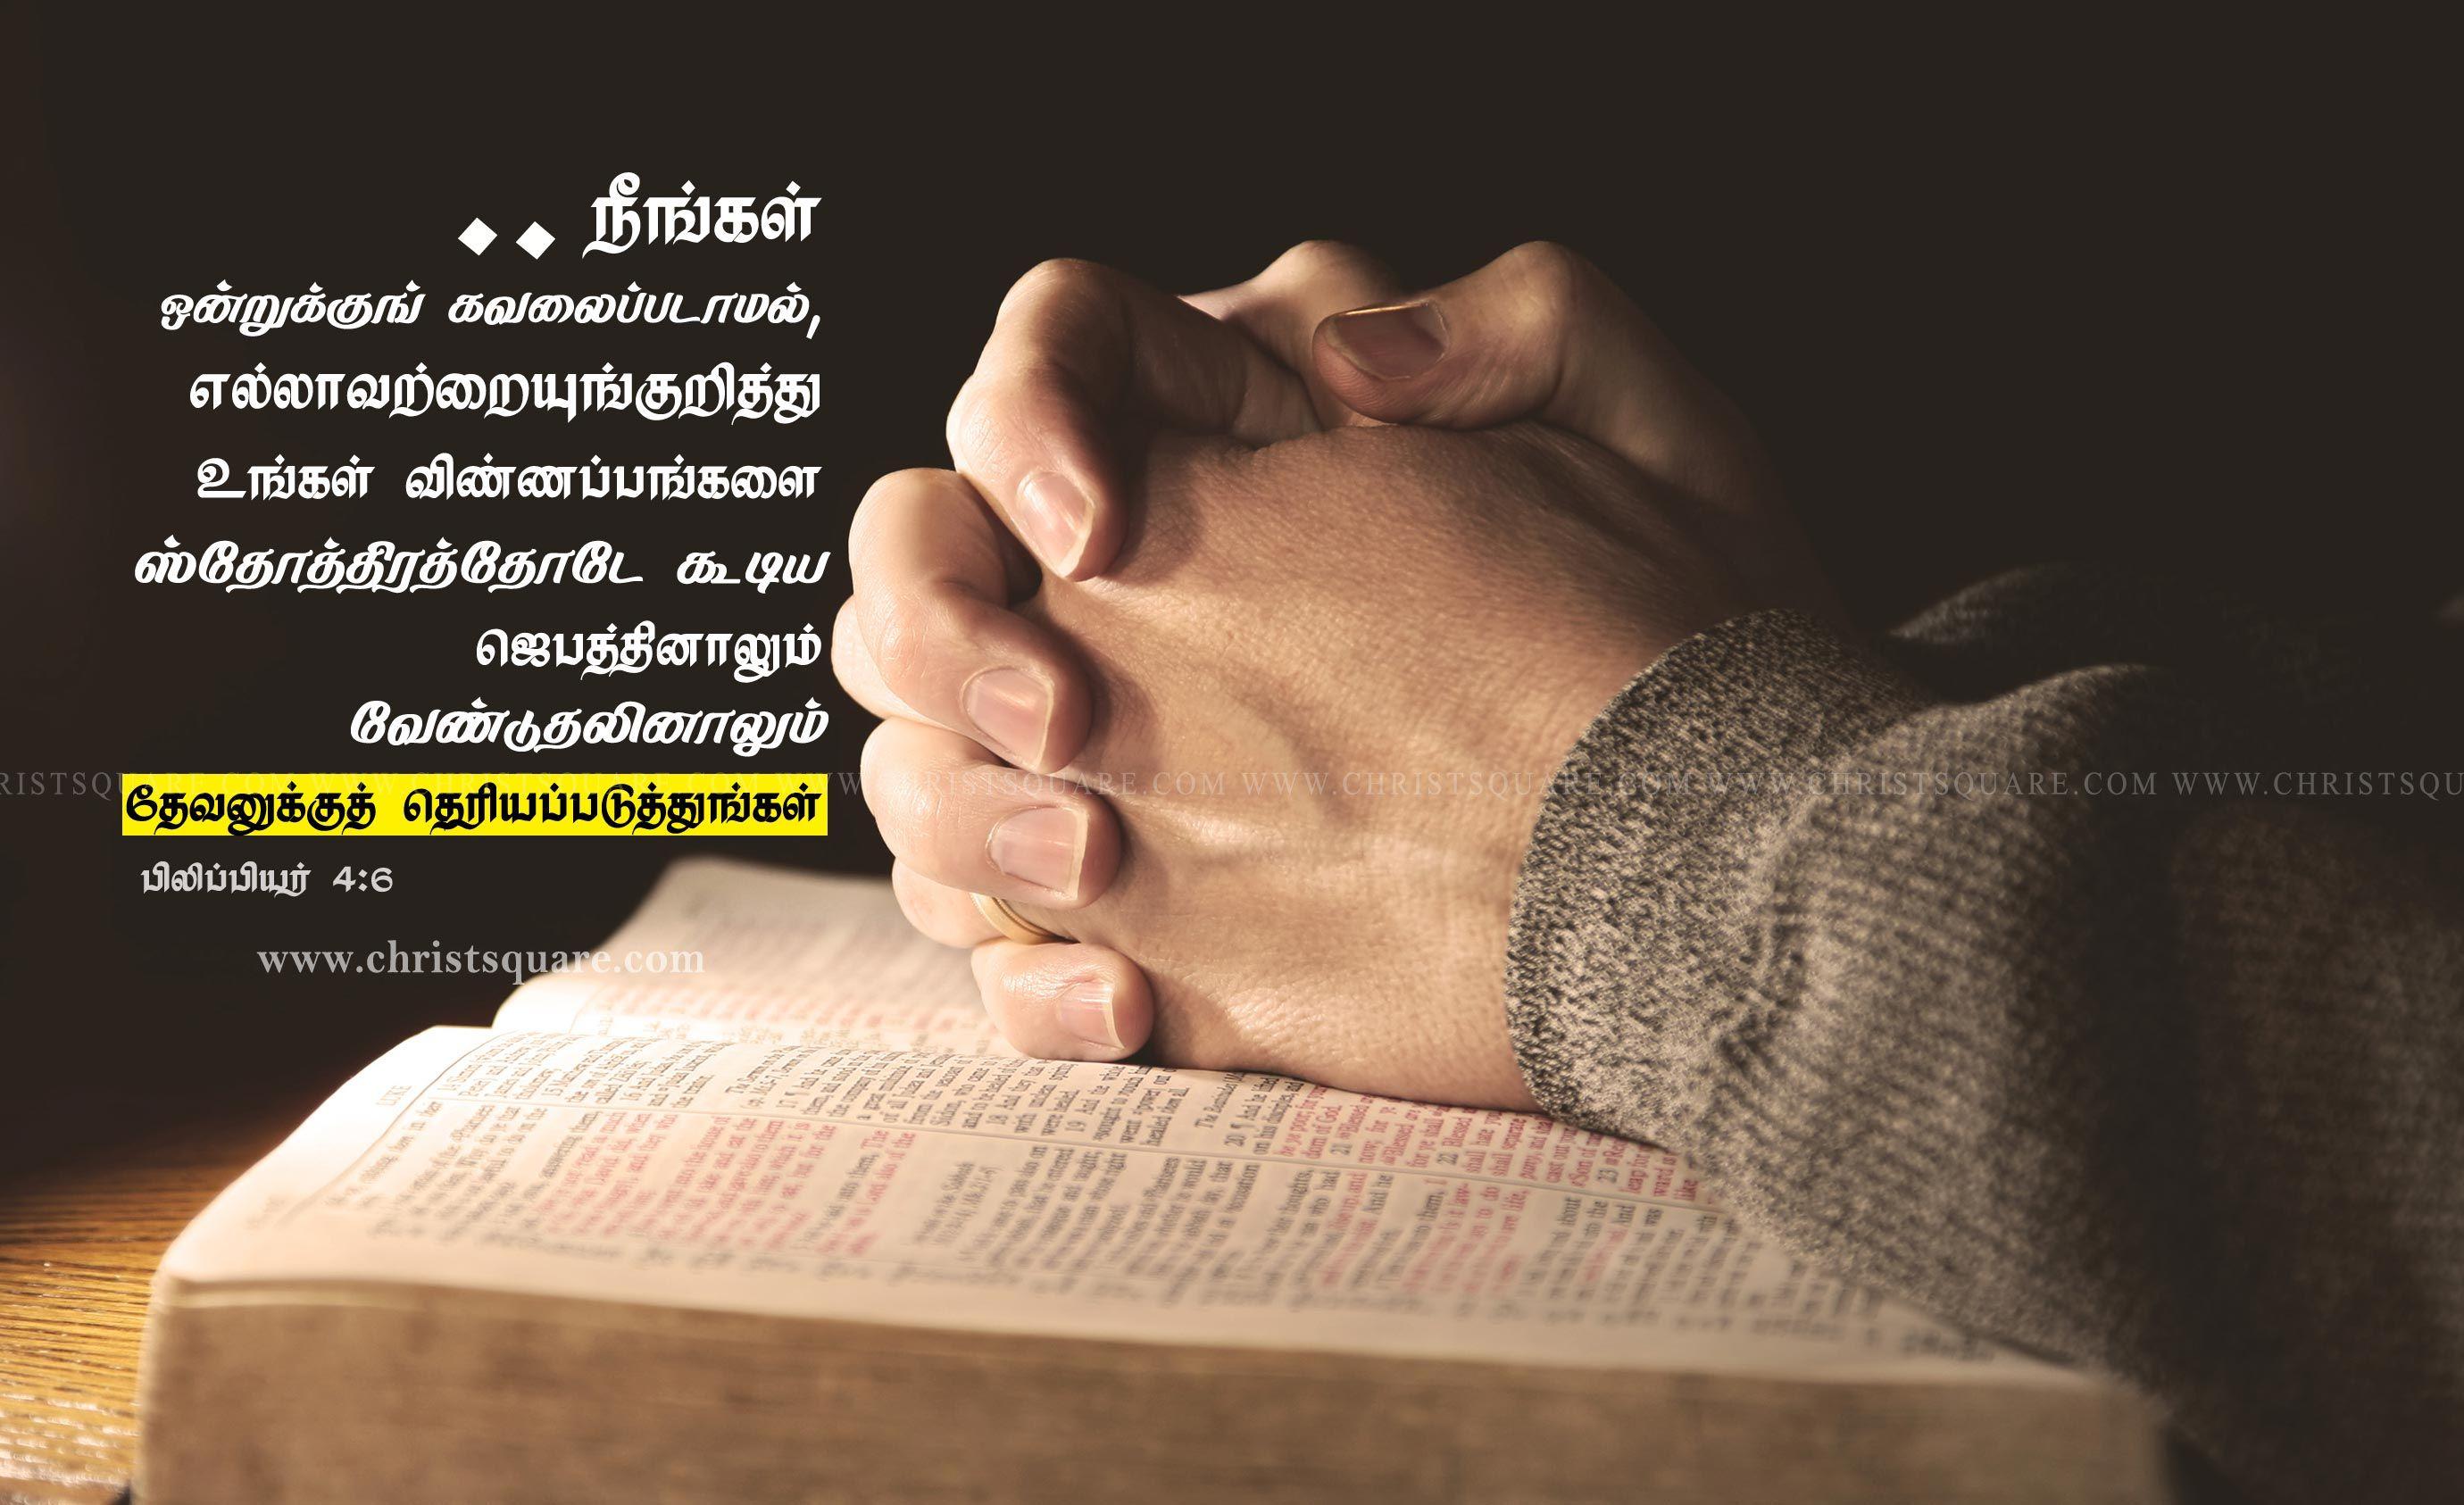 Tamil Christian Wallpaper Hd Mobile Wallpaper Christian Wallpaper